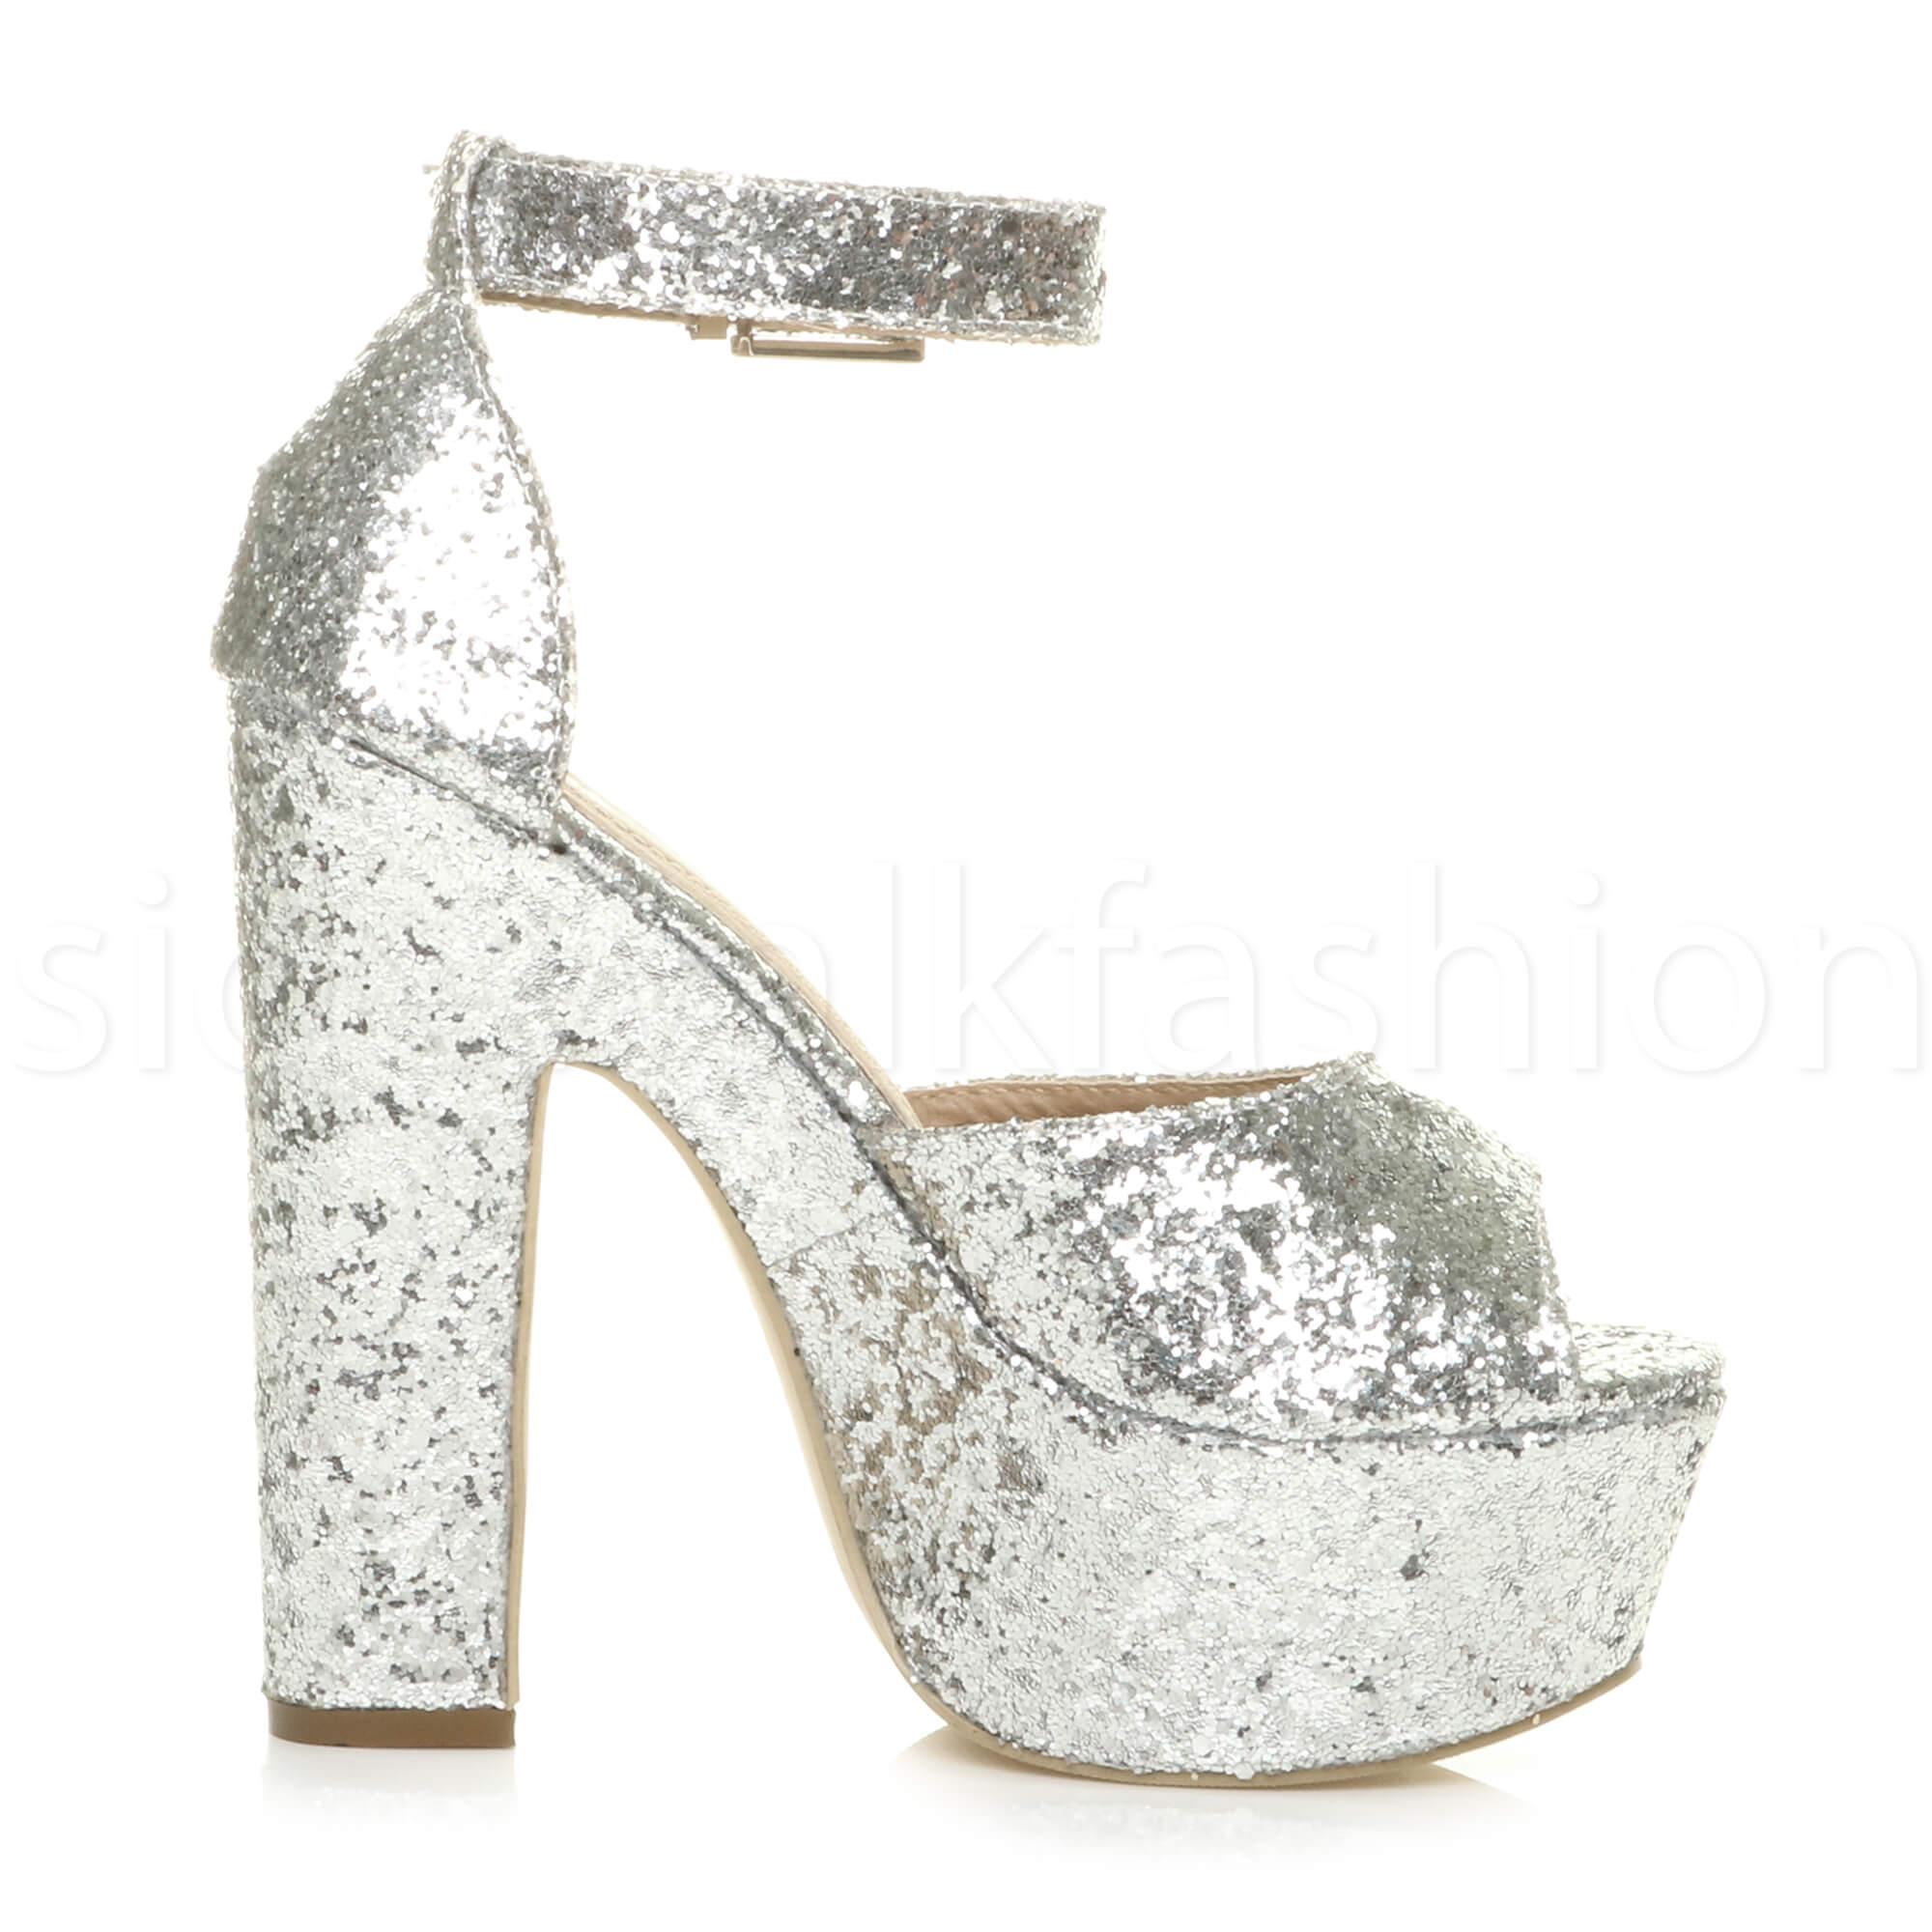 Womens-ladies-high-block-heel-peep-toe-shoes-evening-party-platform-sandals-size thumbnail 24